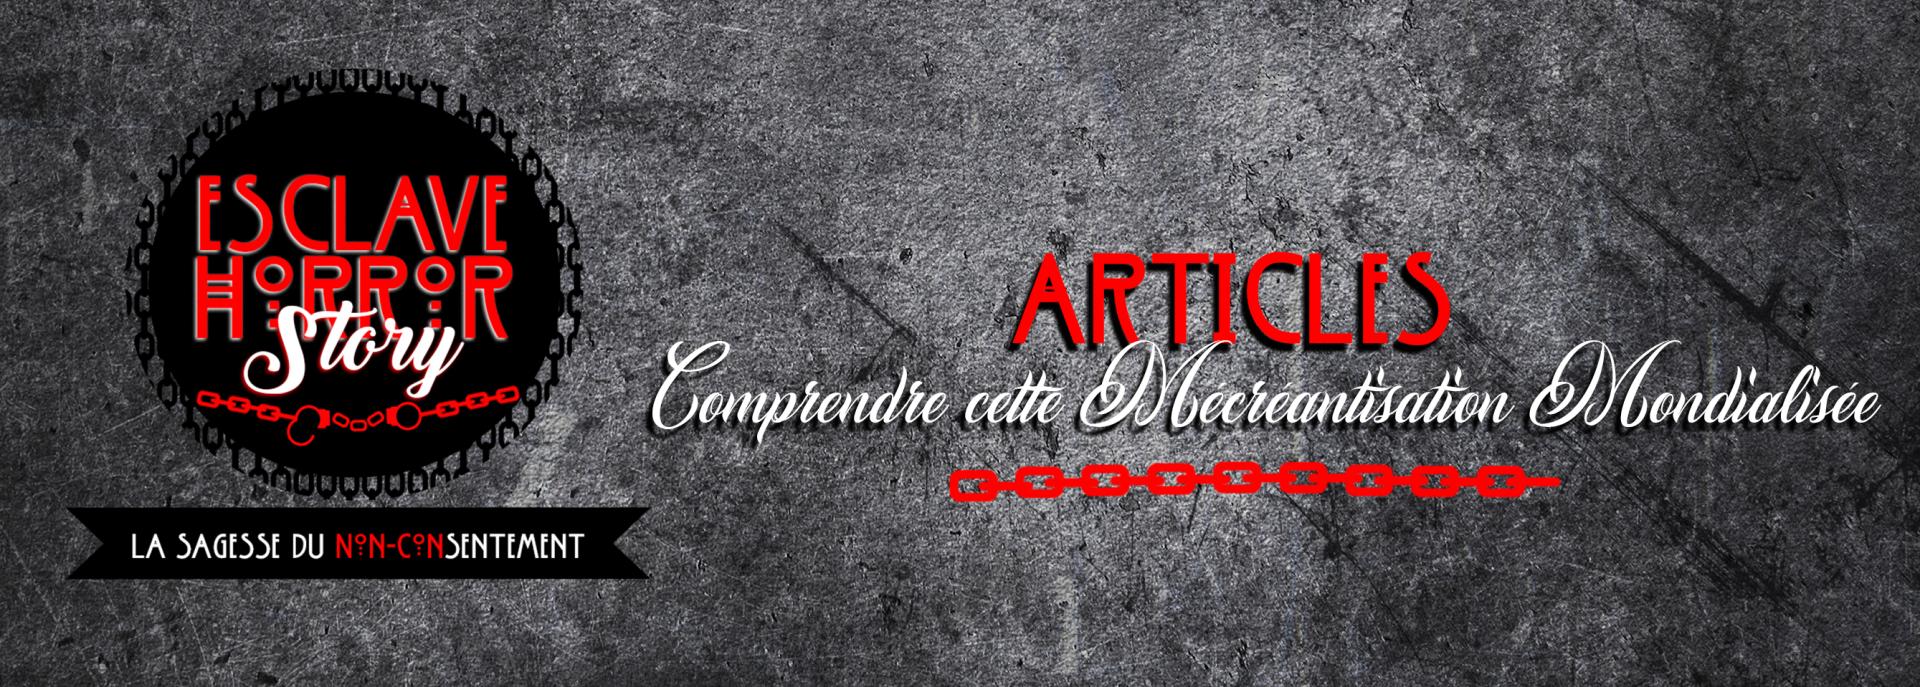 Articles mecreantisation mondialisée - Kafirstan New Order